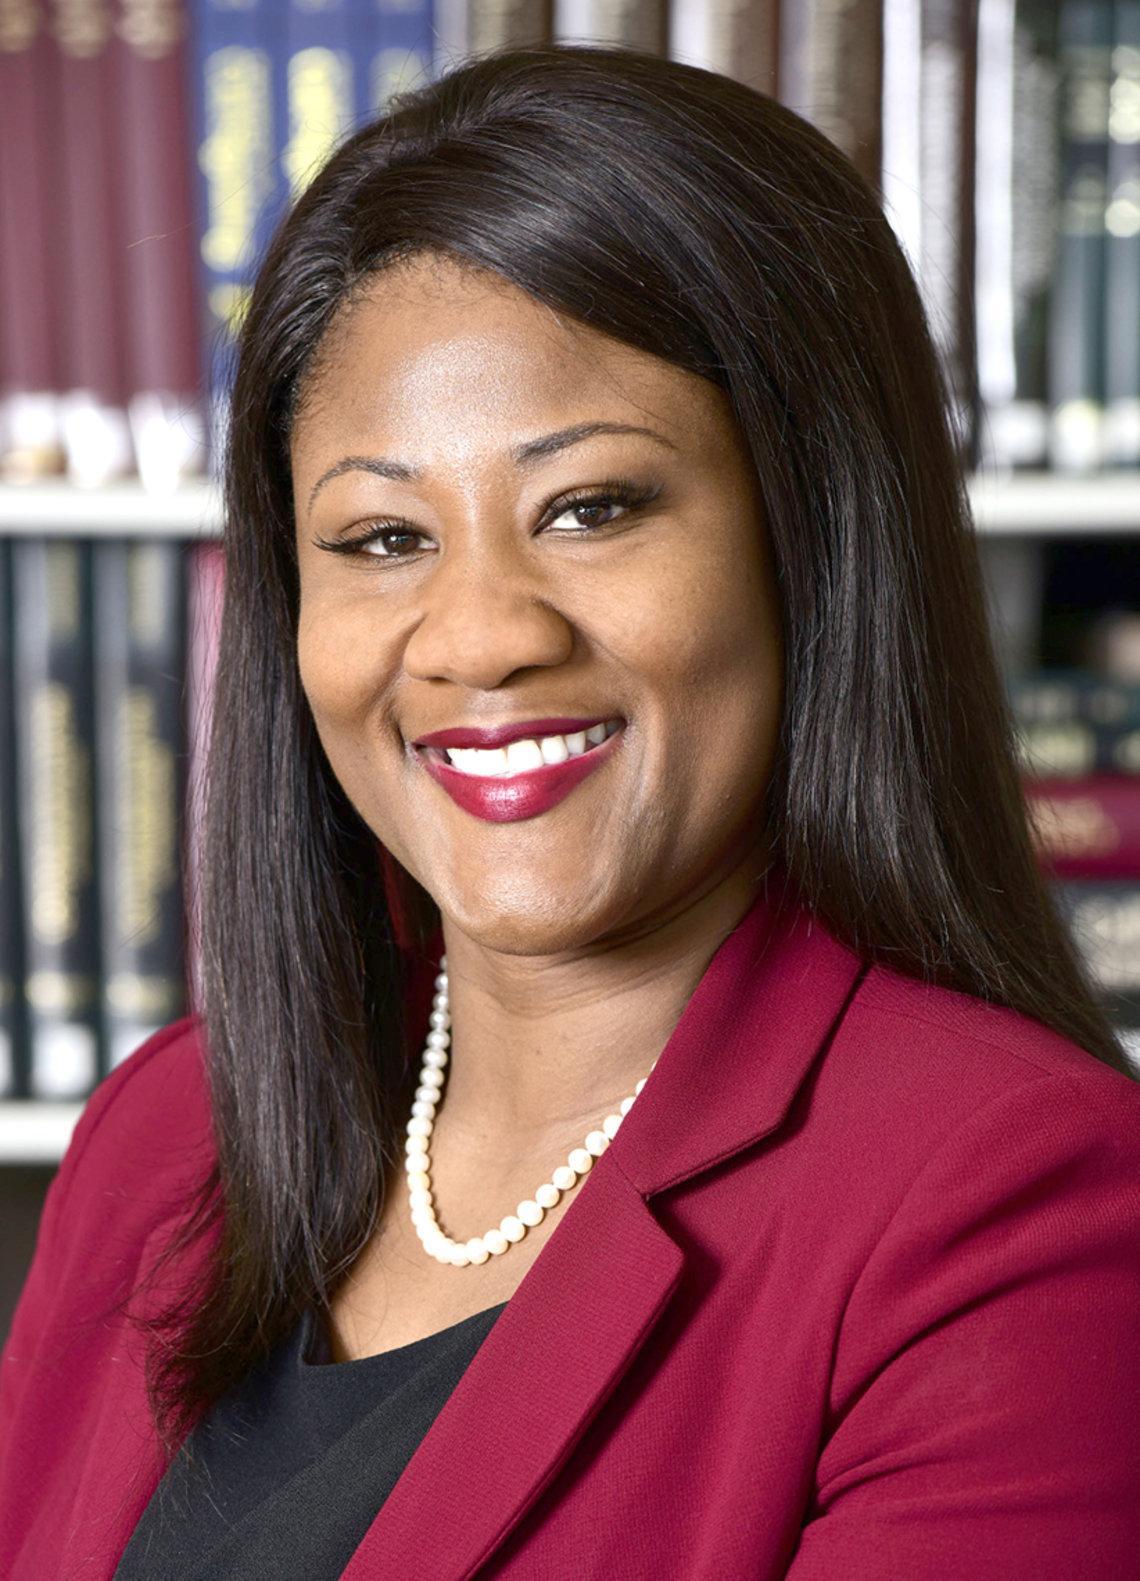 Dr. Chandra L. Jackson